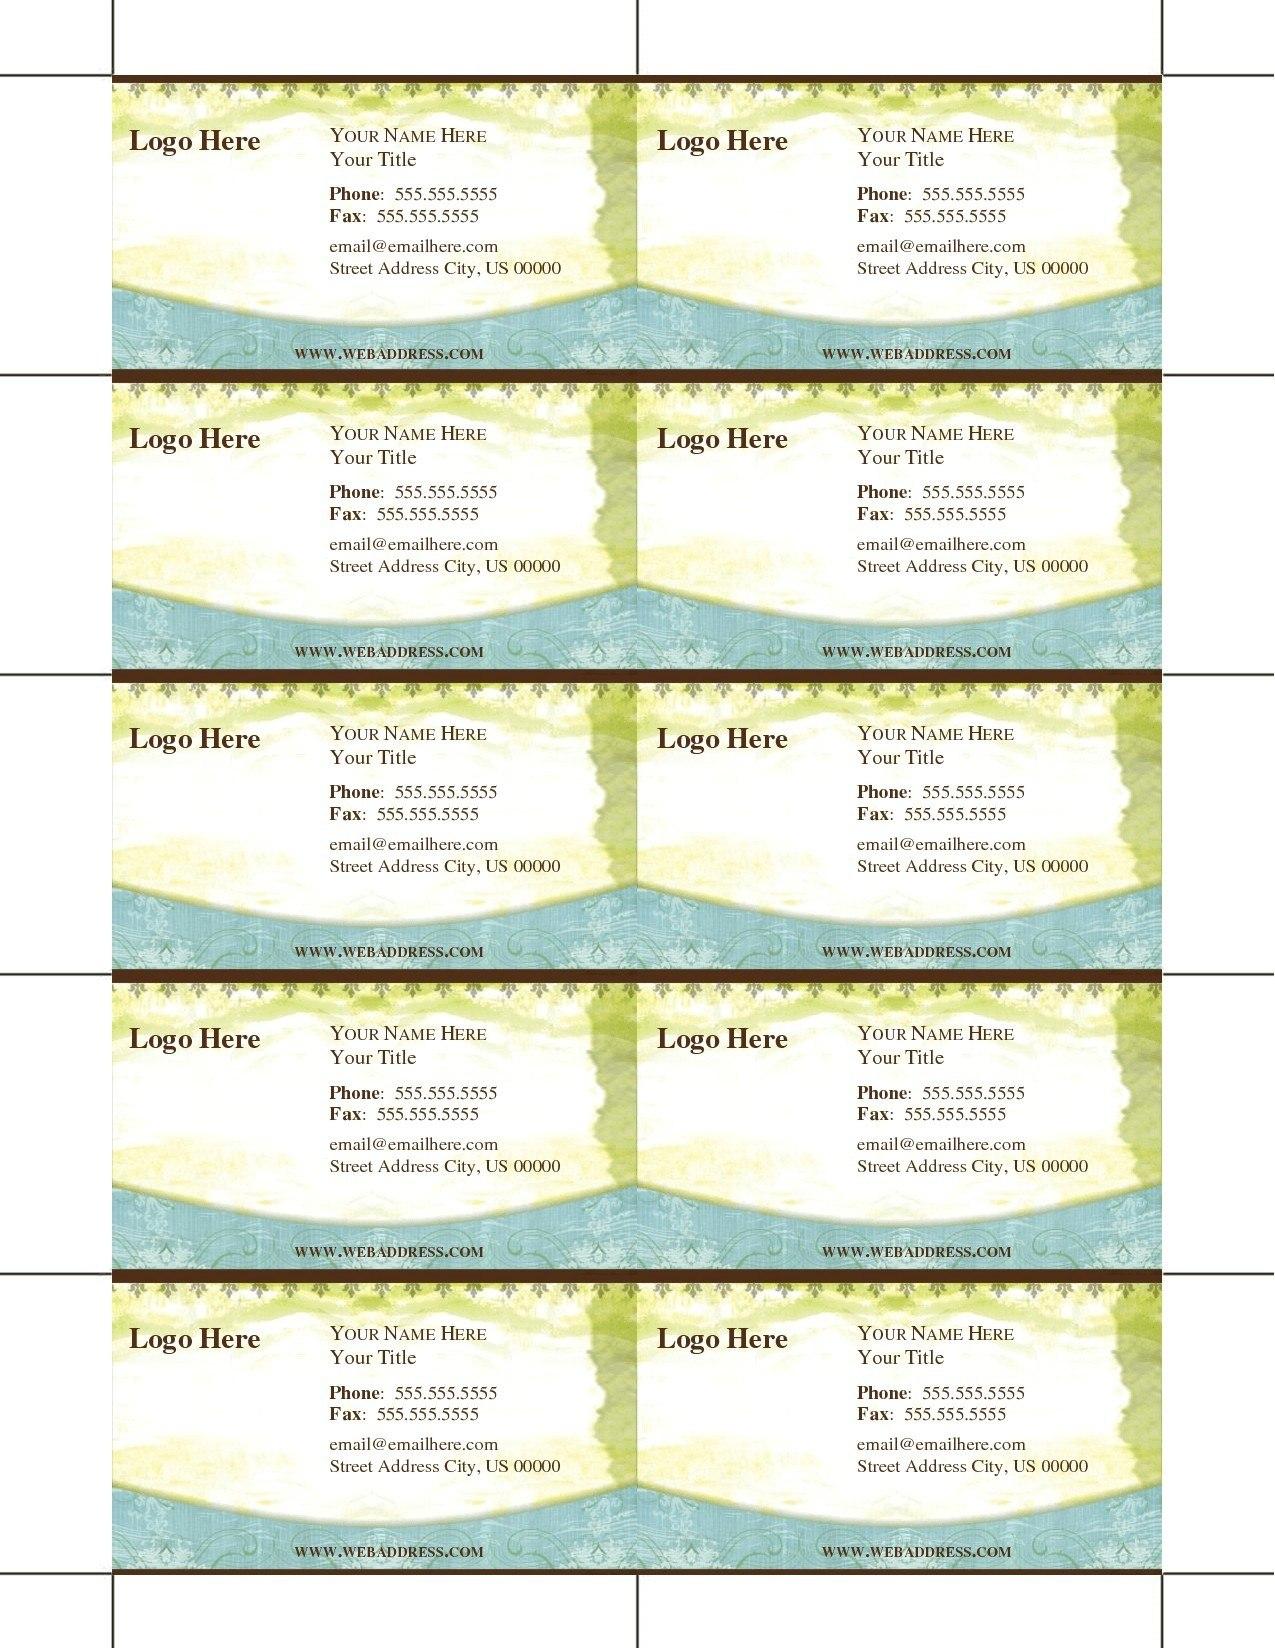 Luxury Blank Business Card Template Microsoft Word  Wwwpantry Regarding Business Cards Templates Microsoft Word